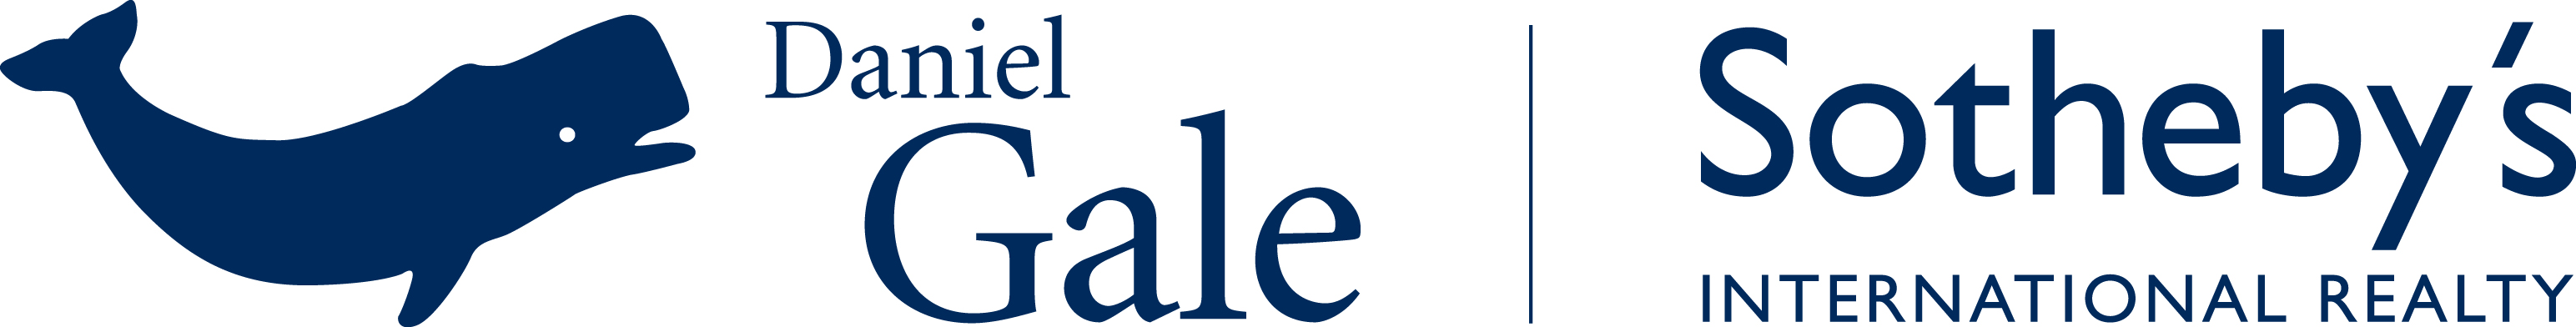 DG_Horizontal_Logo.jpg